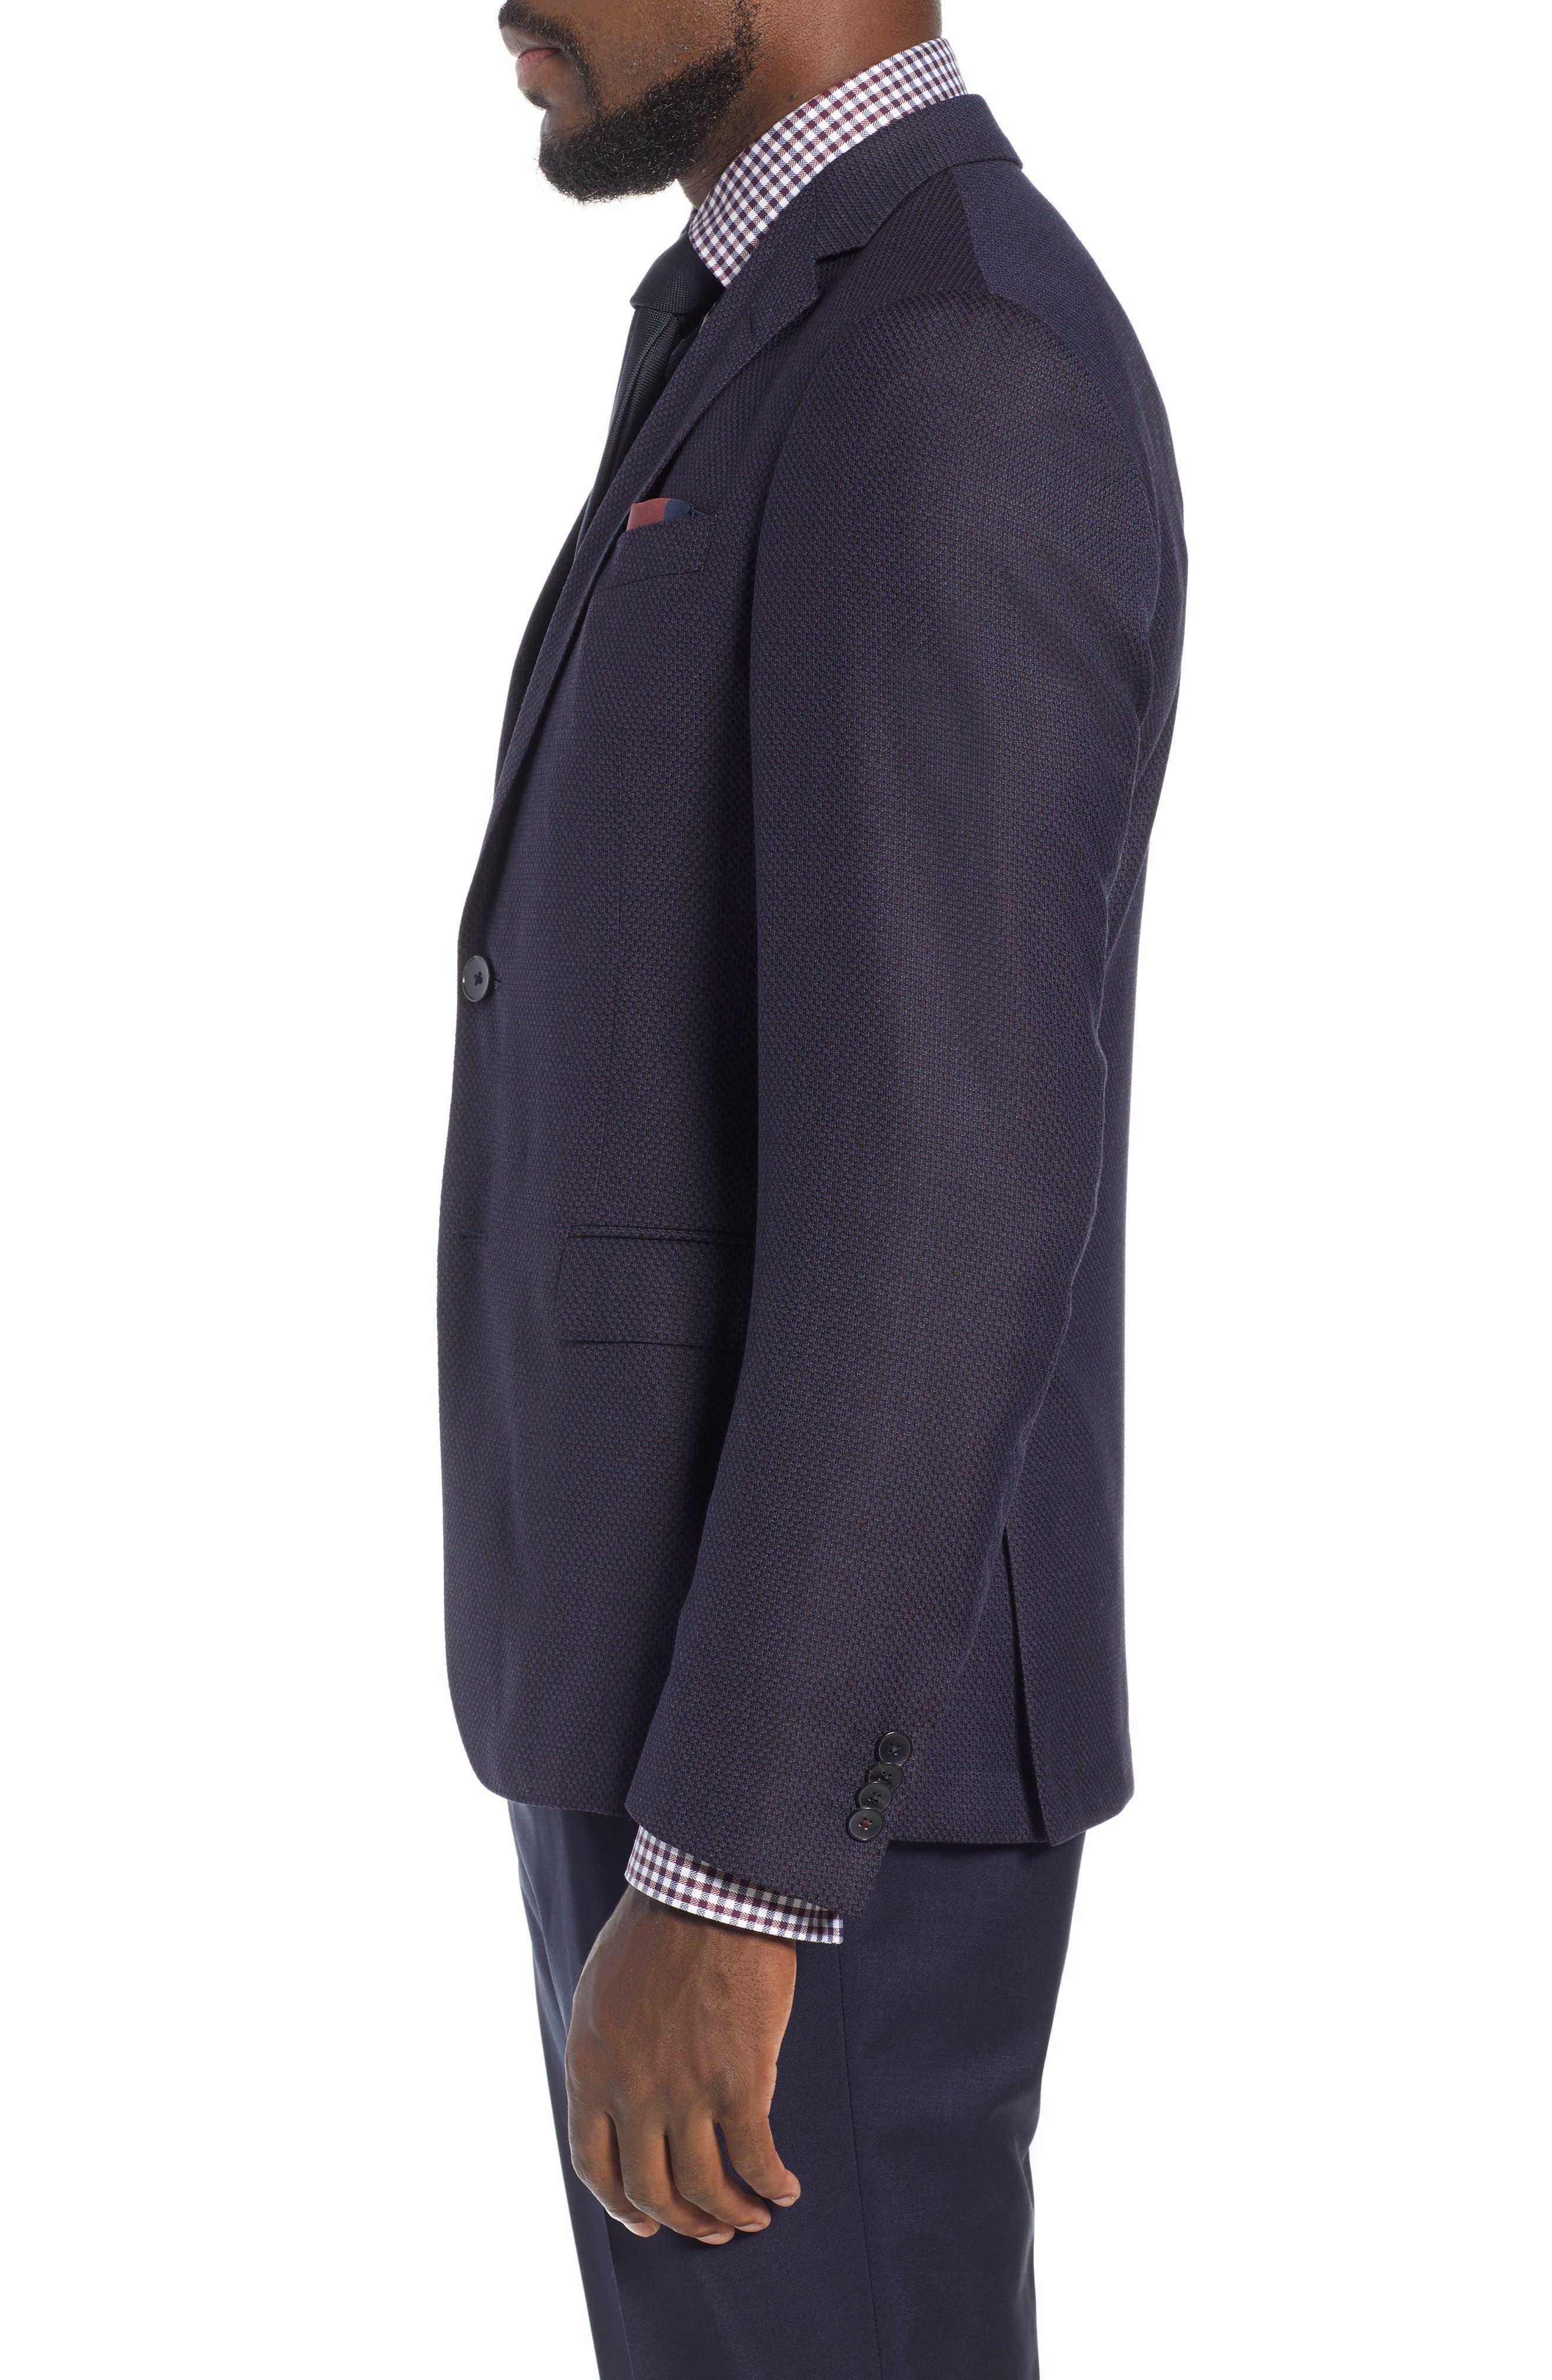 x Nordstrom Nobis Trim Fit Wool Blazer,                             Alternate thumbnail 3, color,                             NAVY